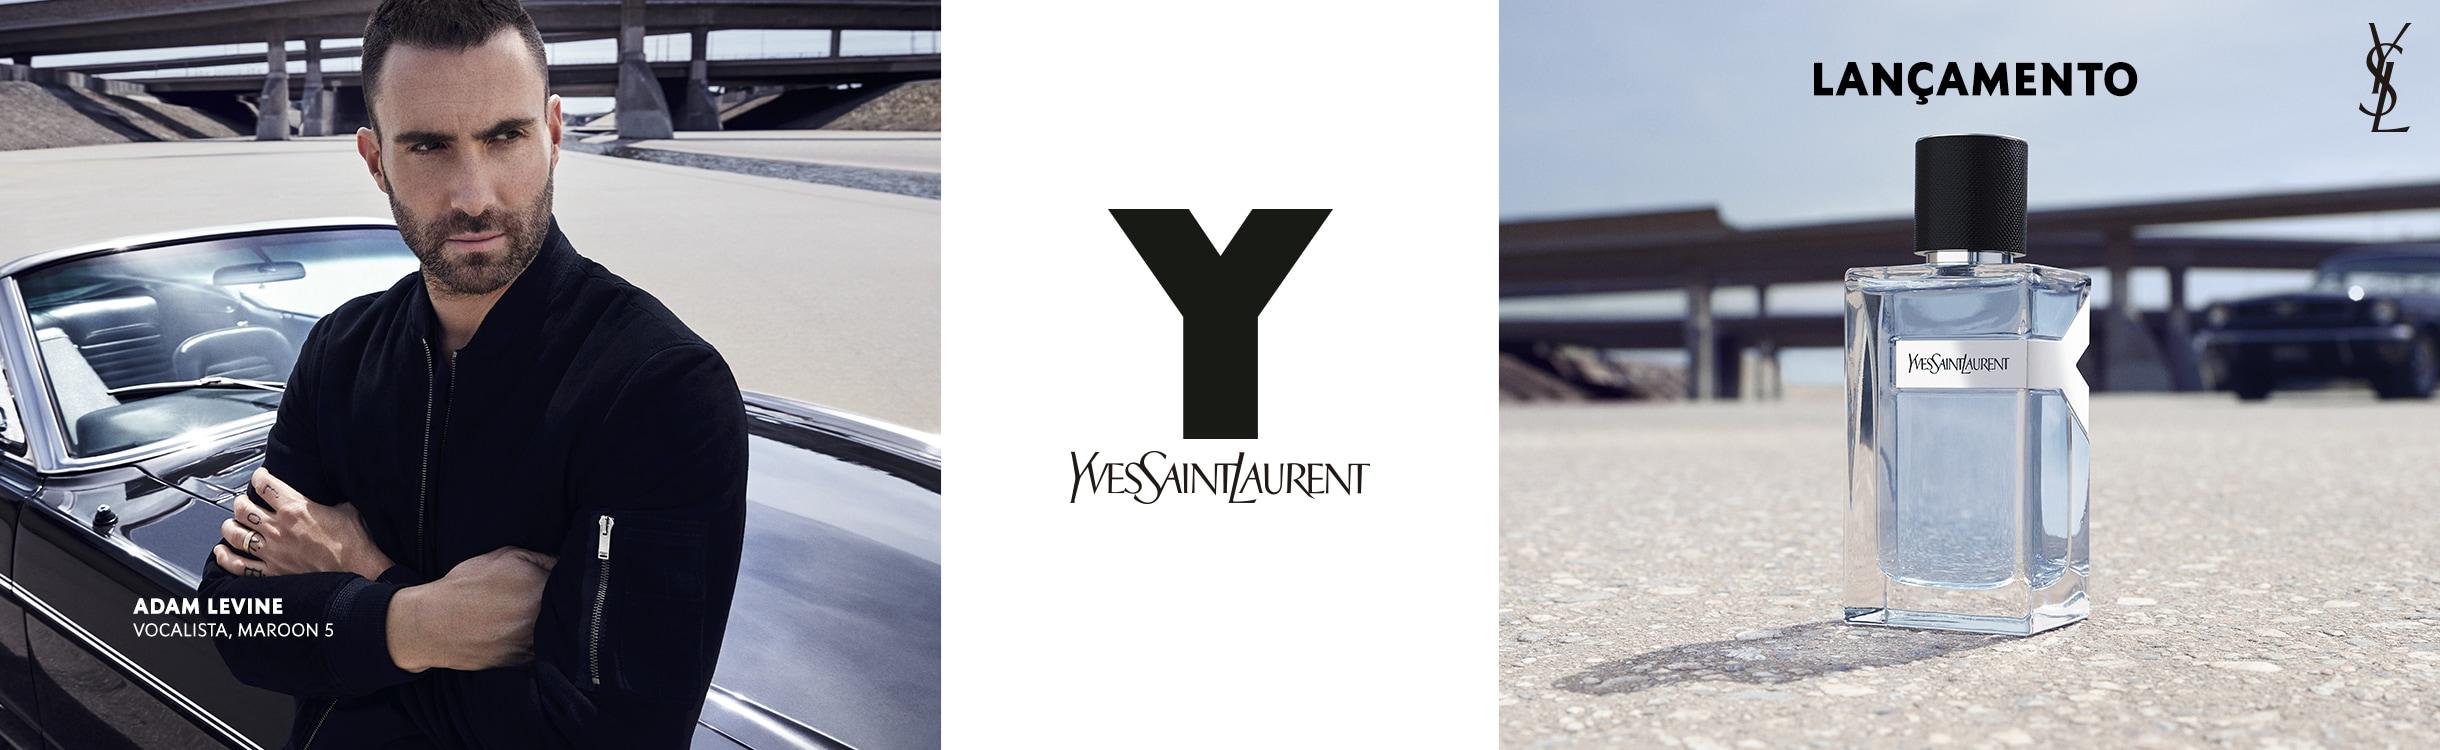 Perfumes Yves Saint Laurent Masculinos